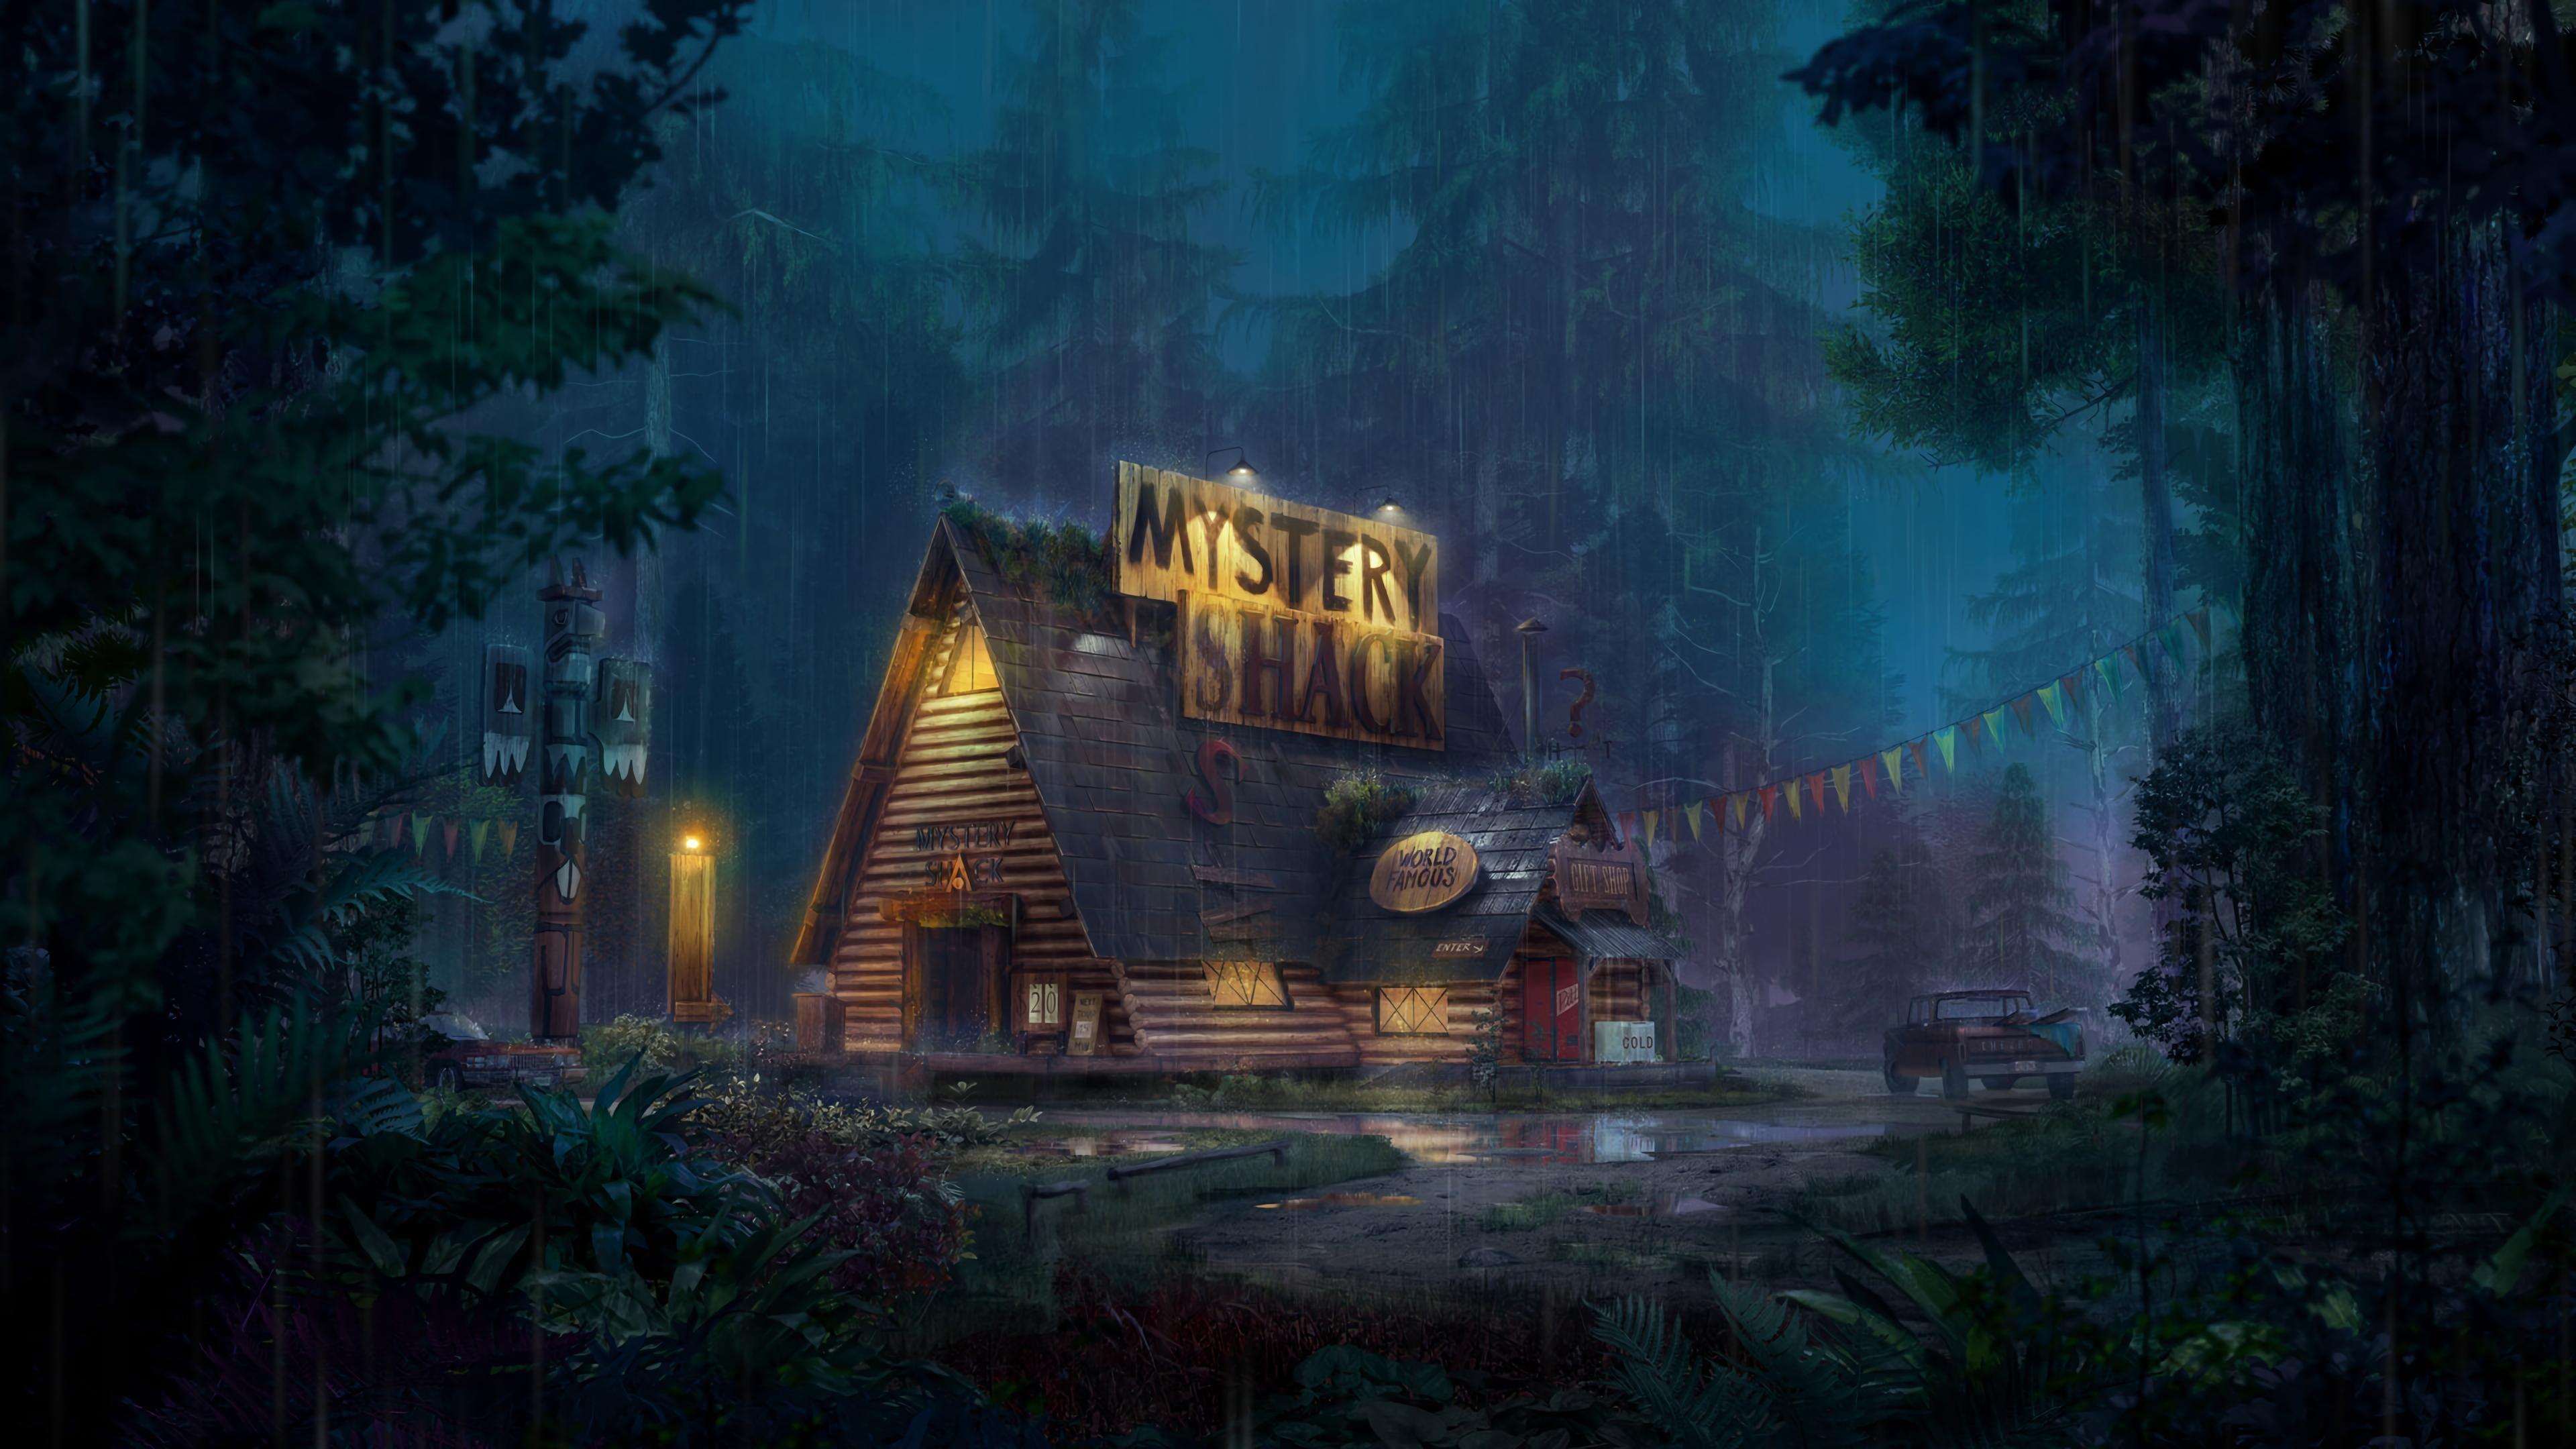 Mystery Shack Gravity Falls In 2020 Gravity Falls Art Gravity Falls Fall Wallpaper